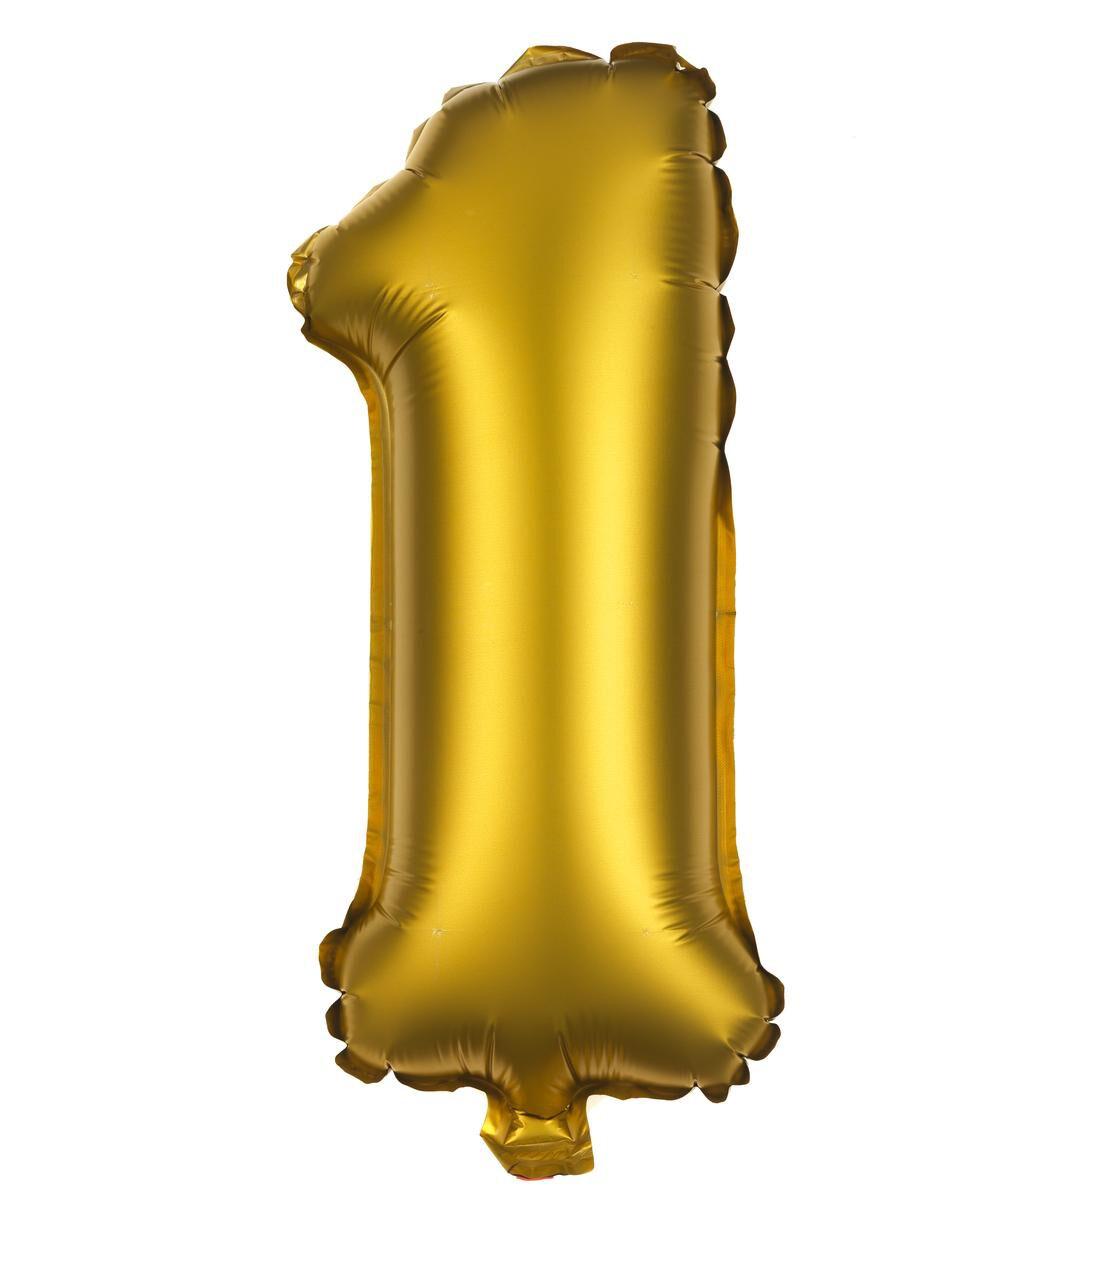 HEMA Folie Ballon 1 (goud)